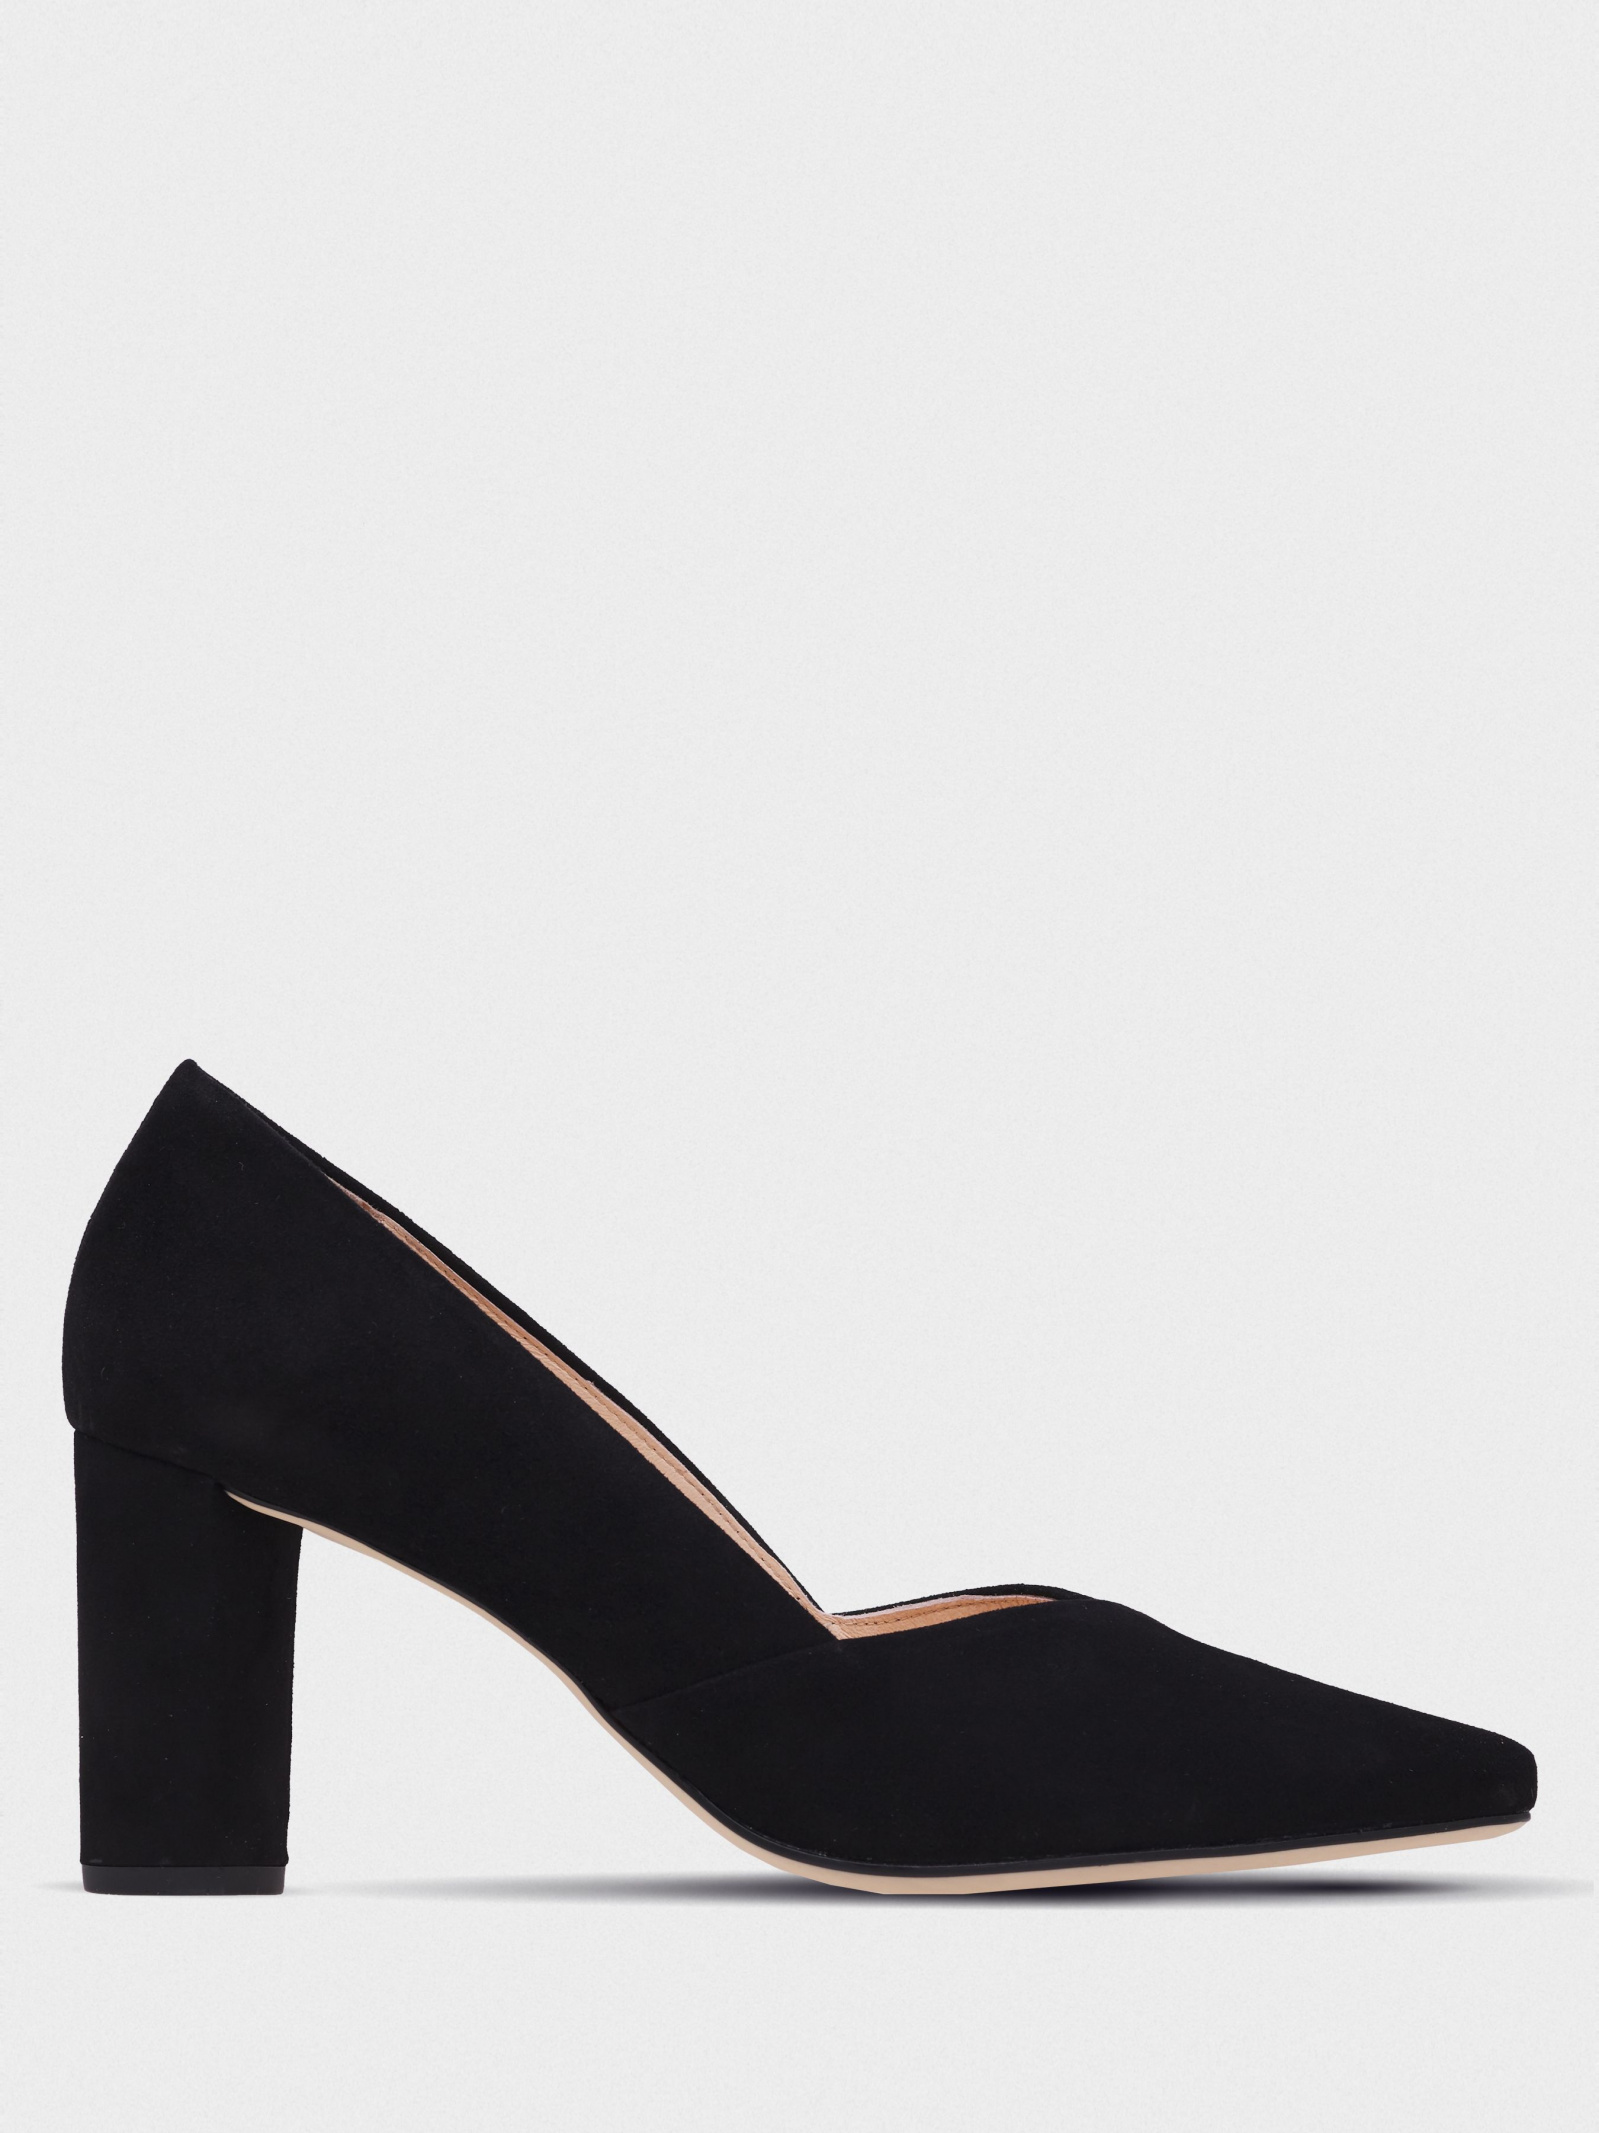 Туфли для женщин Hogl YN4025 купить онлайн, 2017